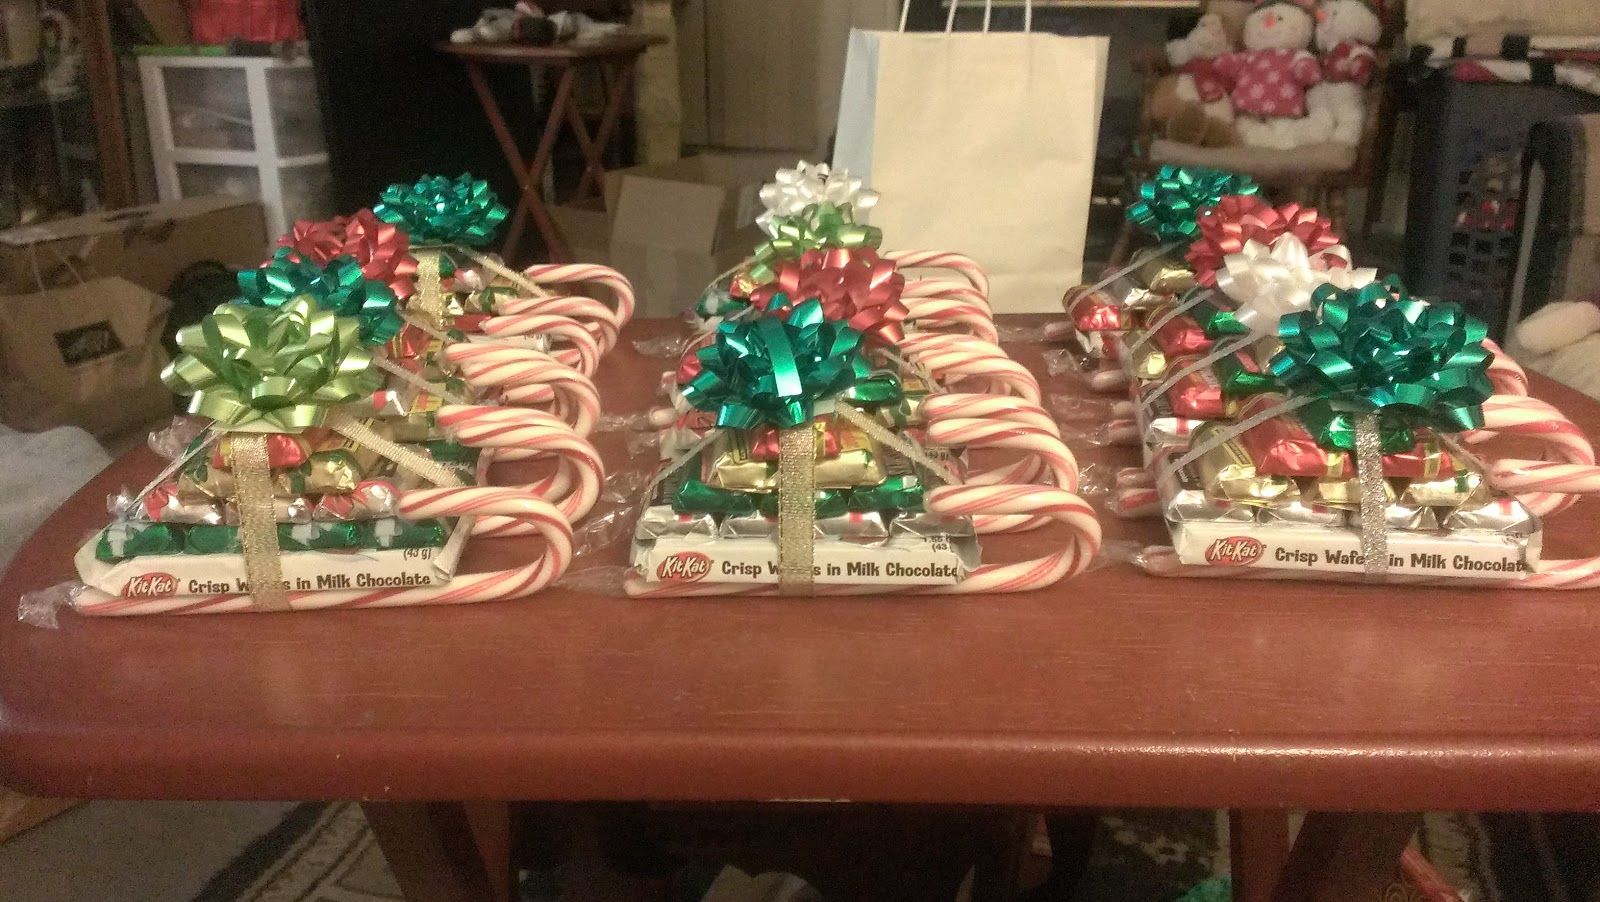 christmas candy sleigh treats - Candy Sleighs For Christmas